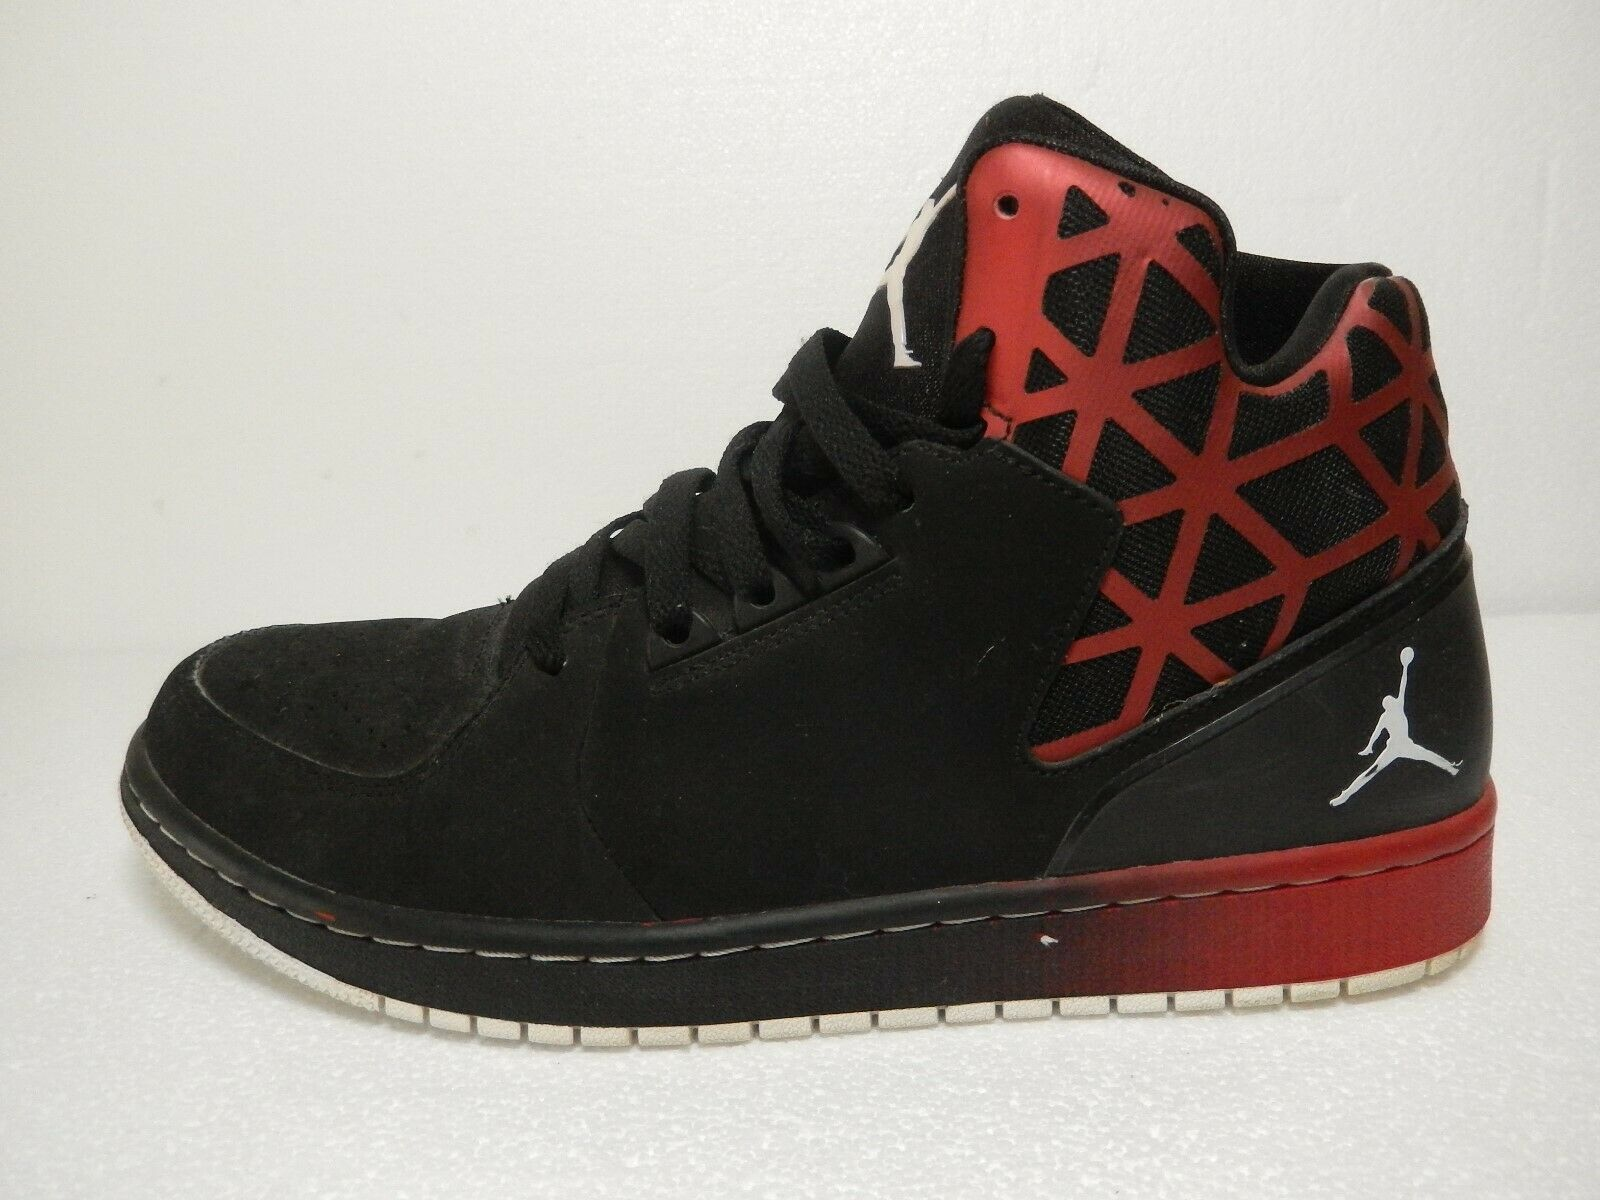 NICE  Nike Air Jordan 1 Flight 3 Men's Size 9.5 Black Red Pre-Owned 743188-001